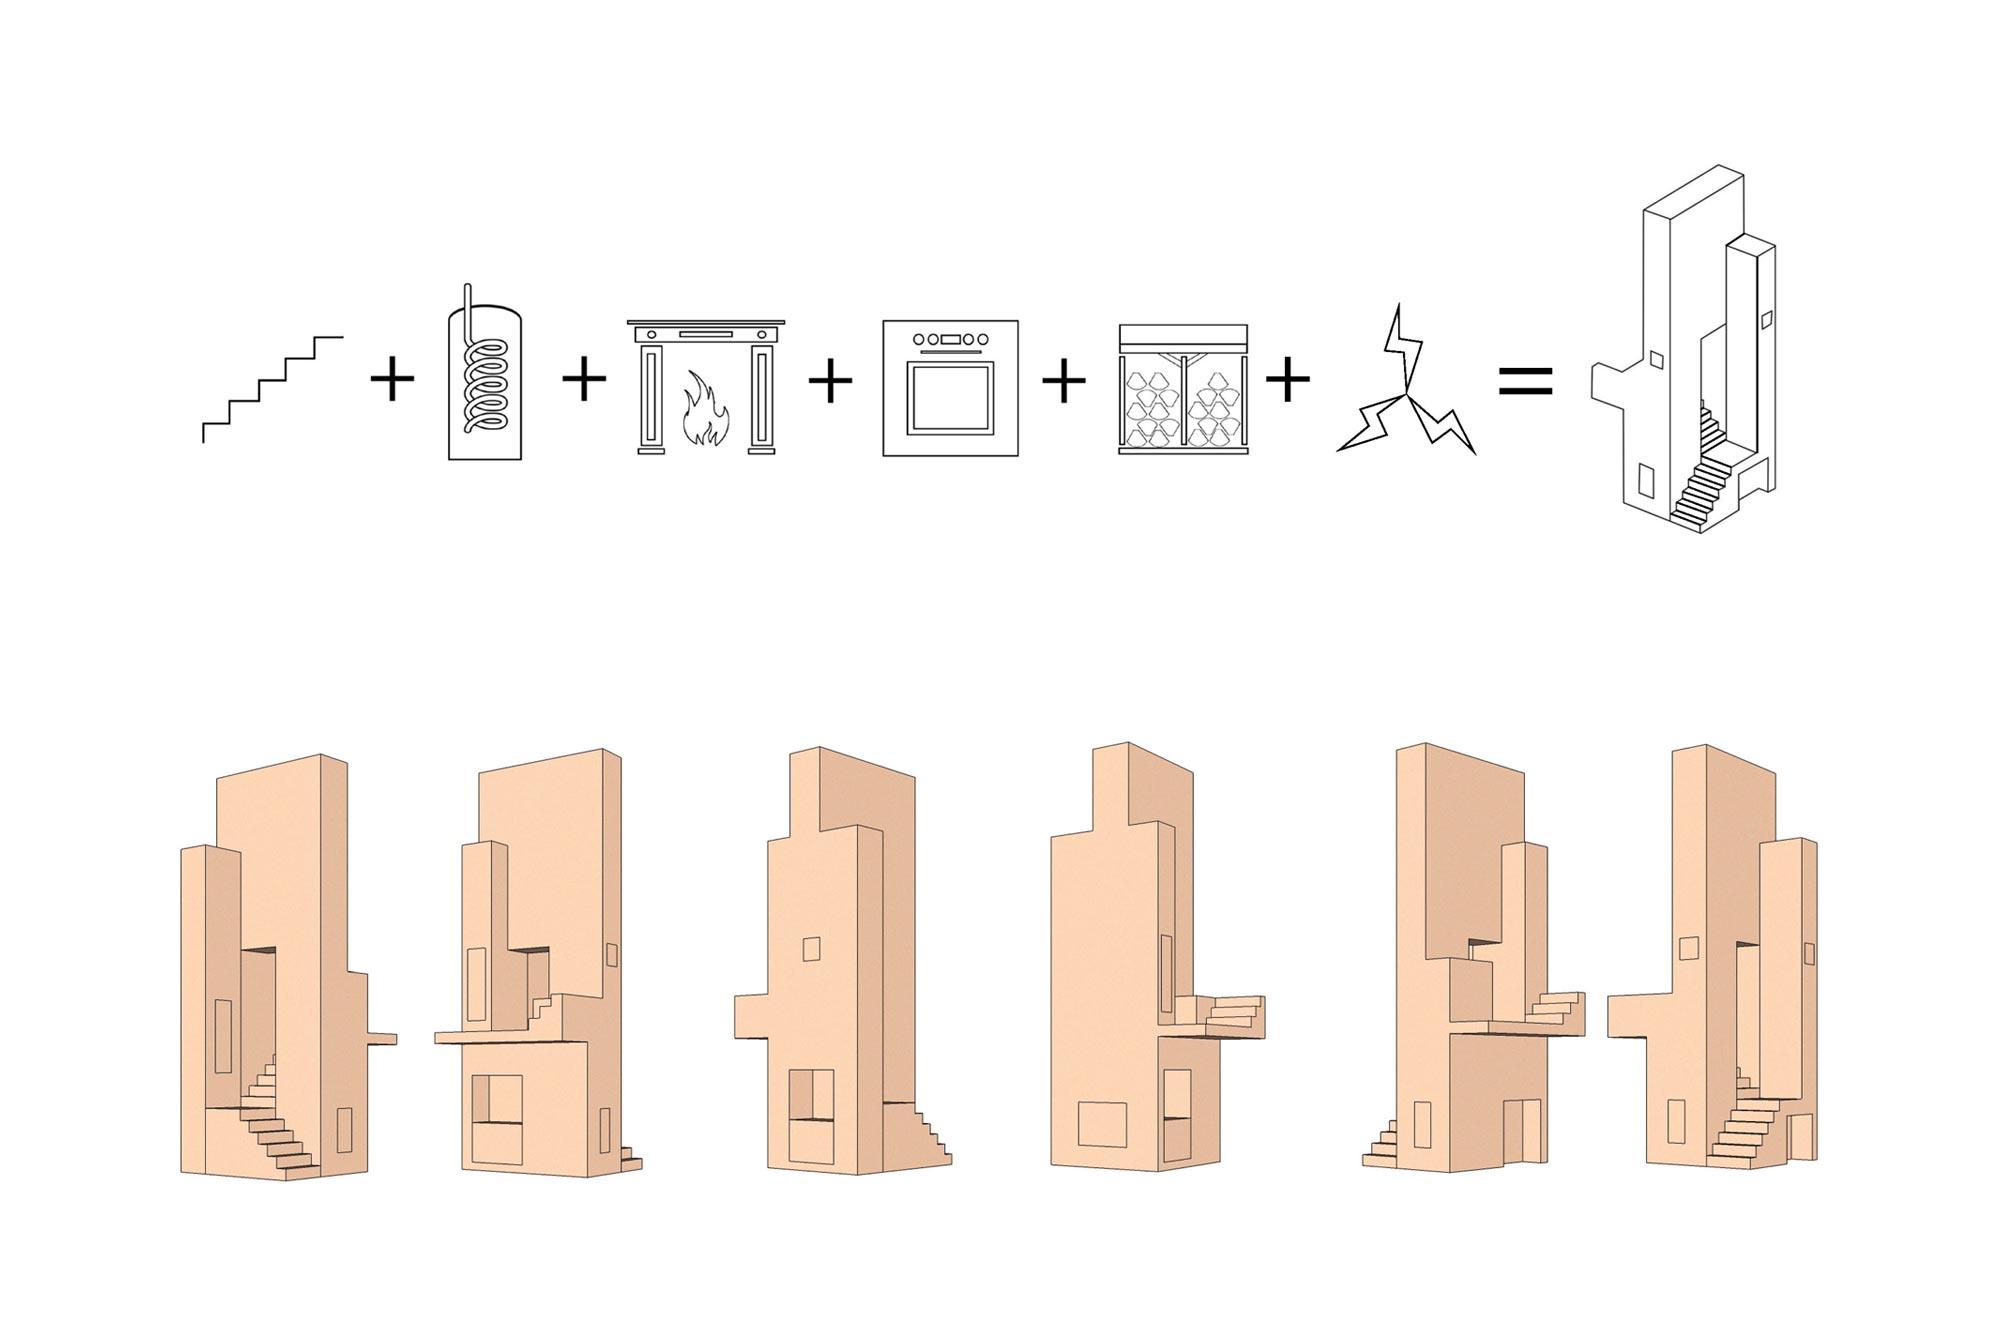 cube-haus-skene-catling-architects-cs-2000×1332-05